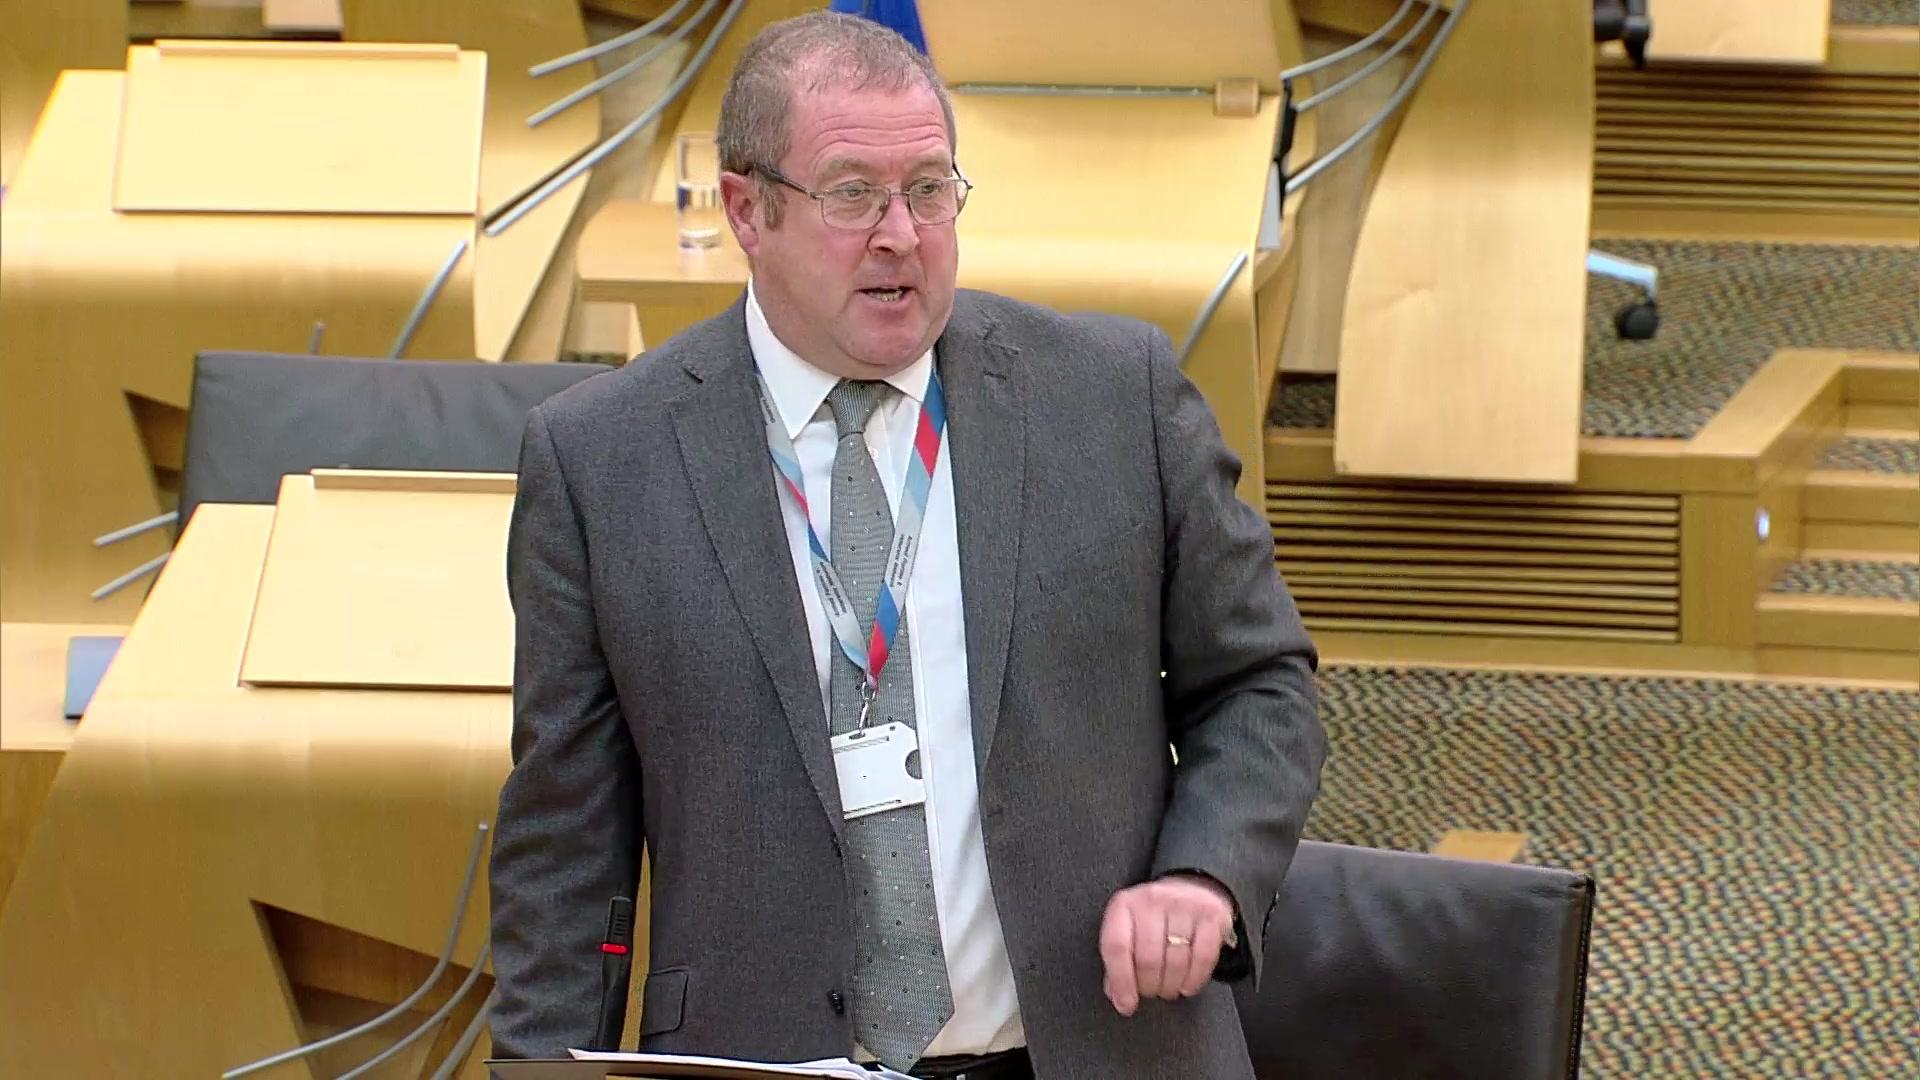 Ministerial Statement: Decarbonising Scotland's Transport